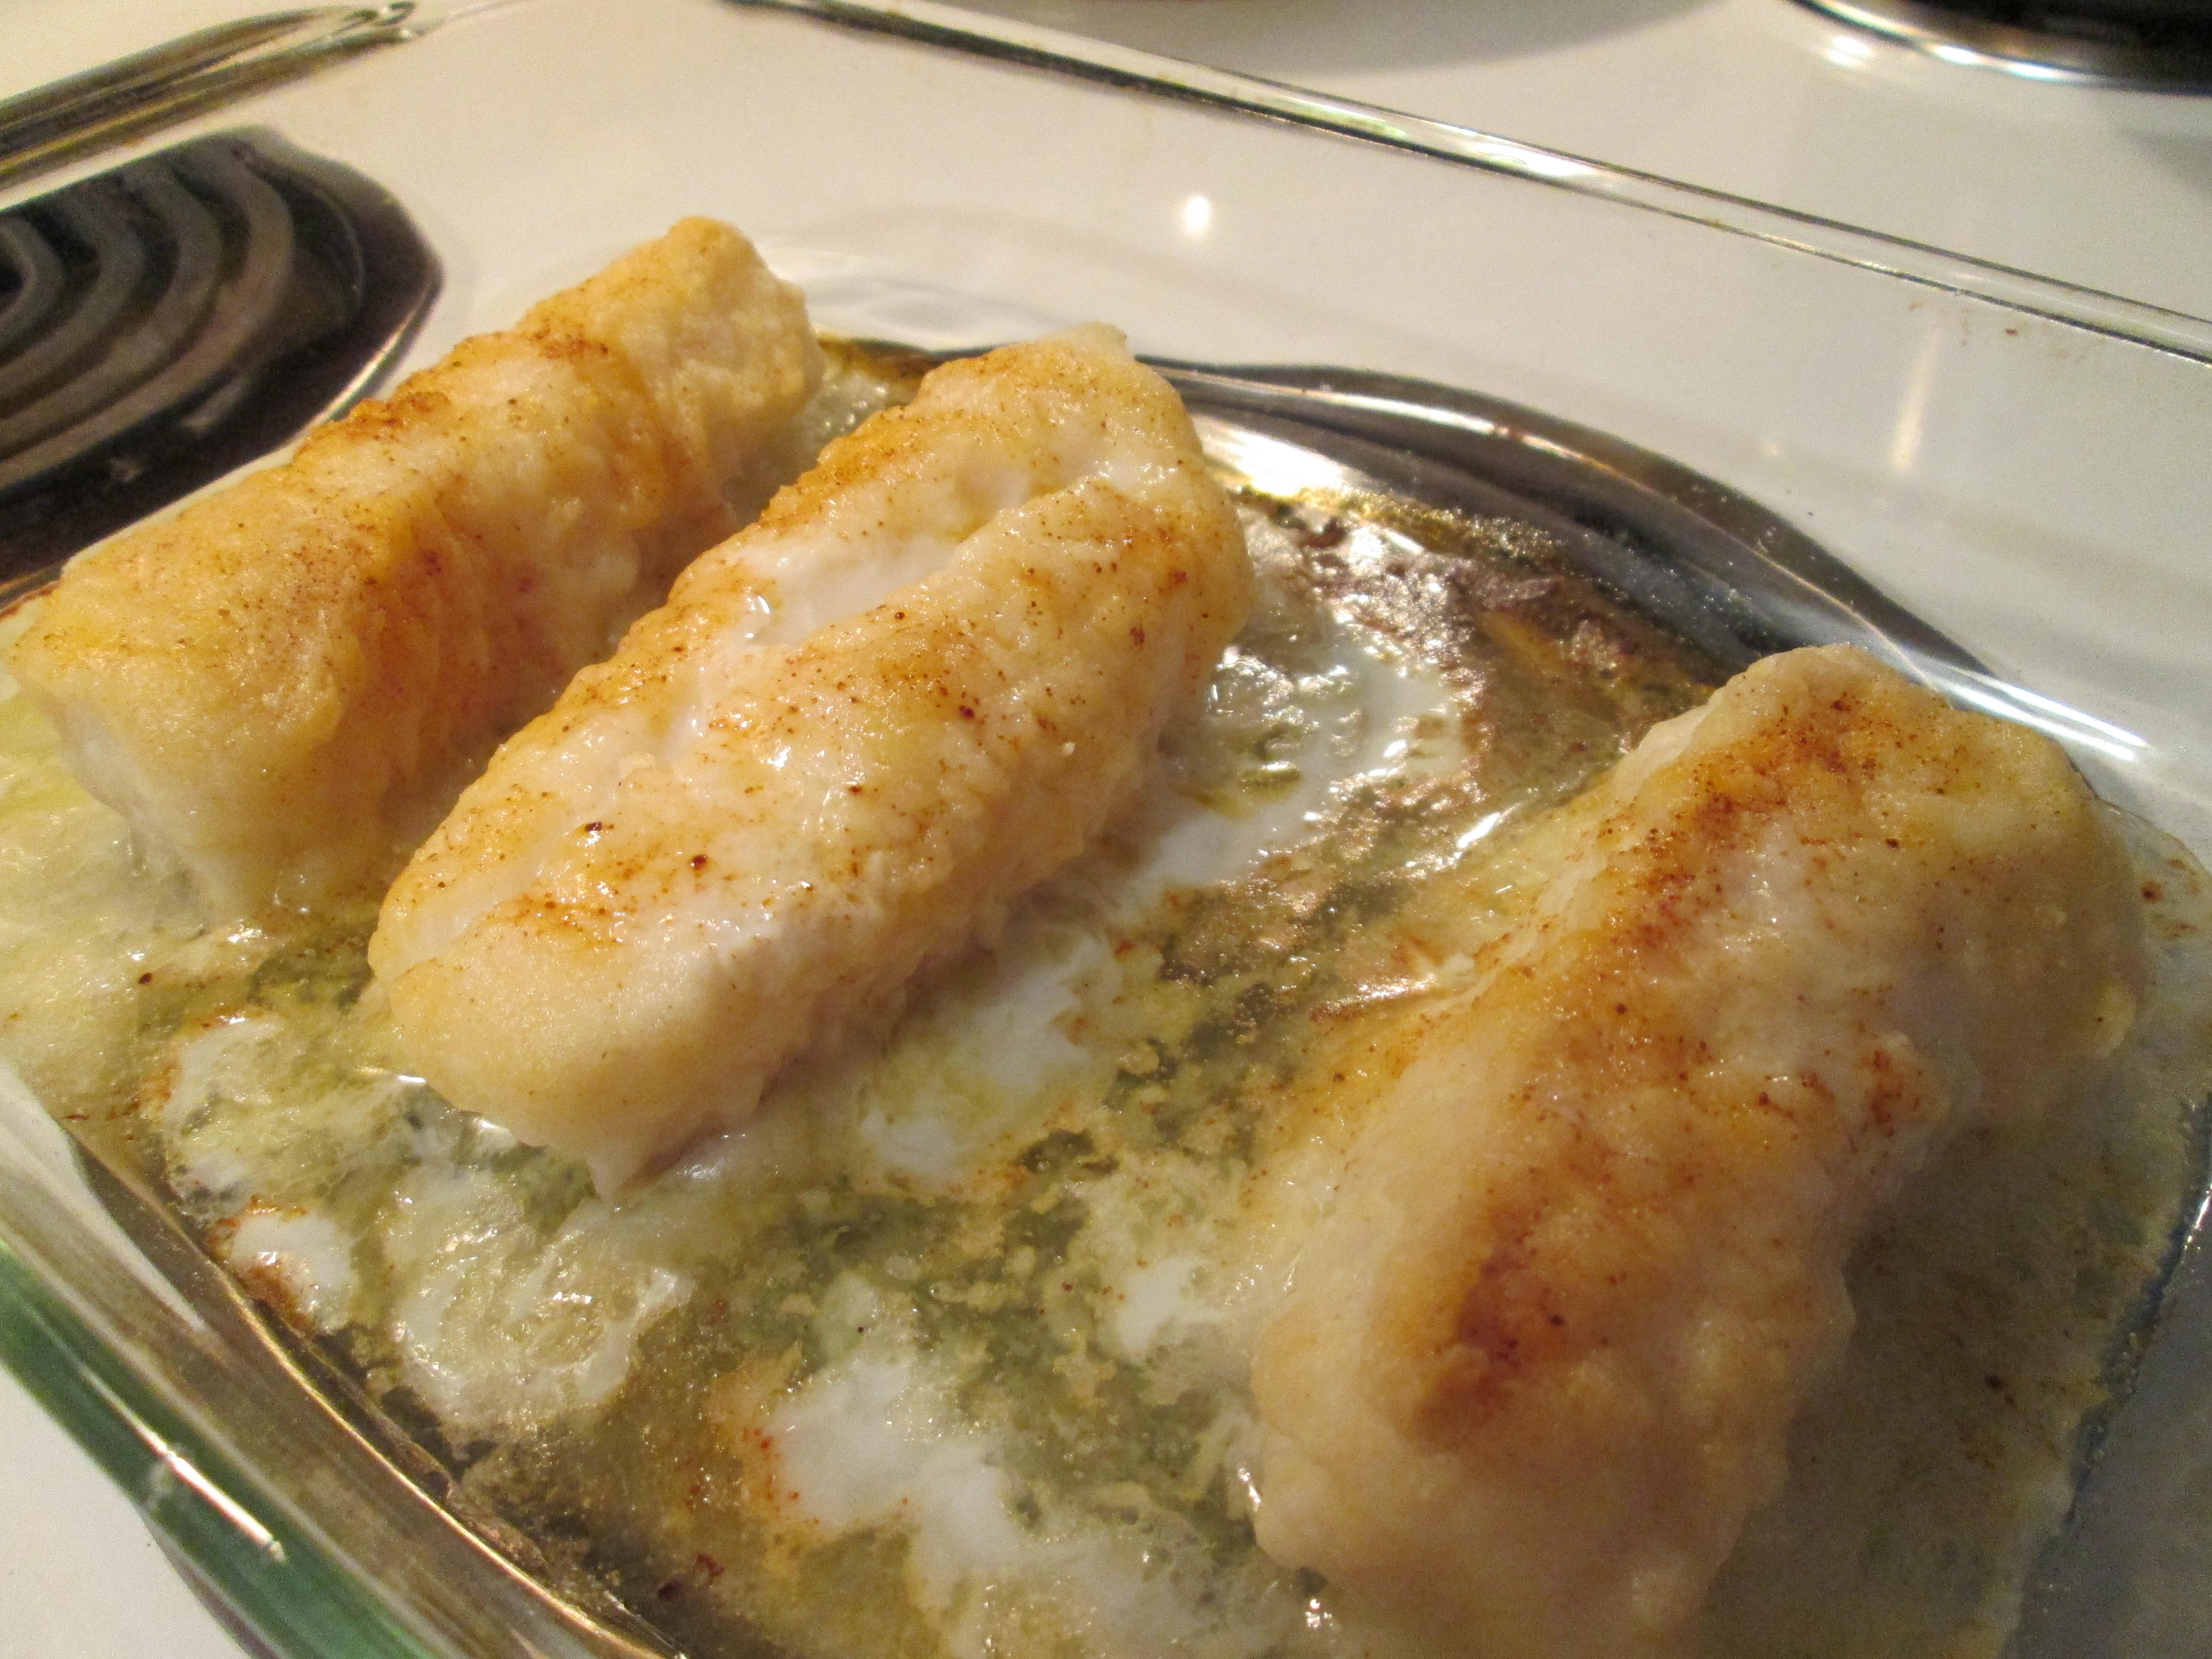 Lemon baked cod w red potato wedges seasoned blackeyed for Bake cod fish